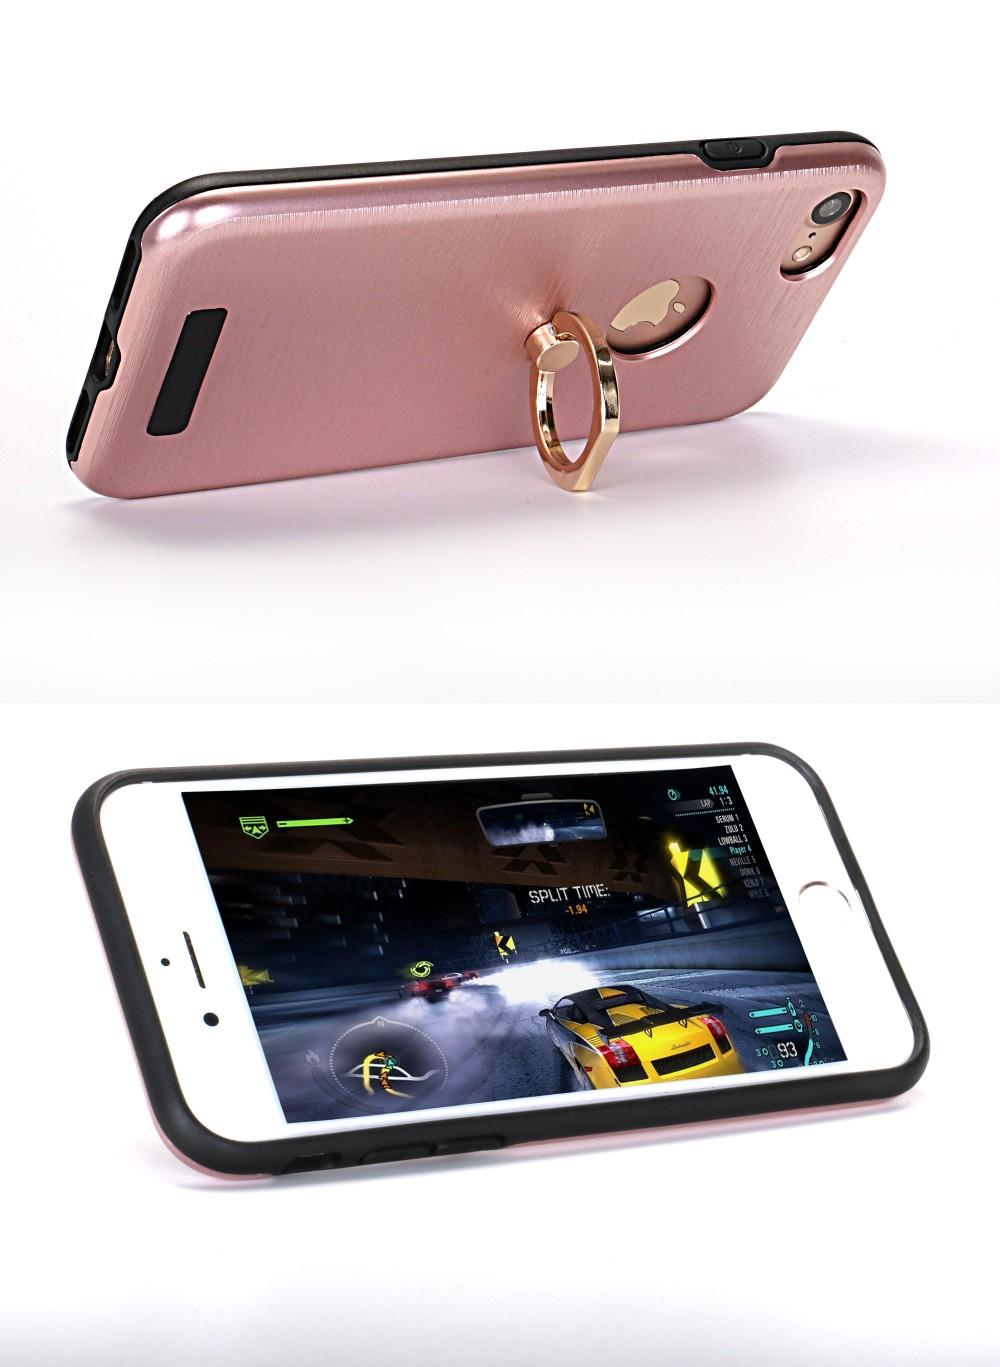 Accesorios para celulares for iphone 7 fundas with ring - Fundas de telefonos moviles ...